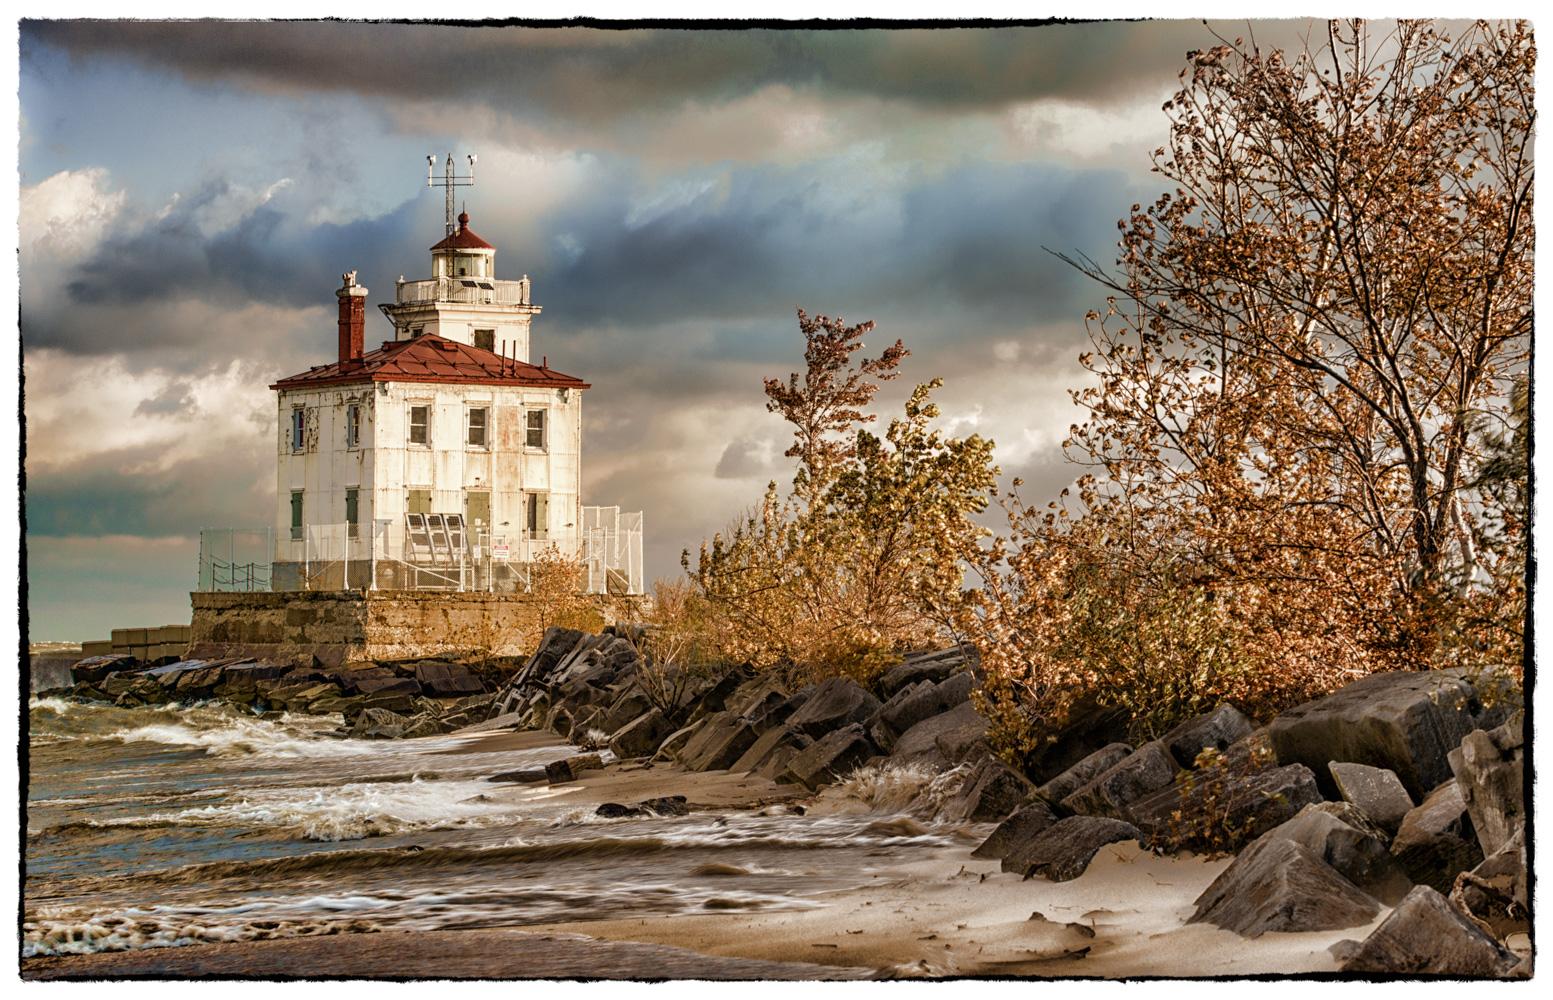 Fairport Harbor West Breakwater Lighthouse, USA